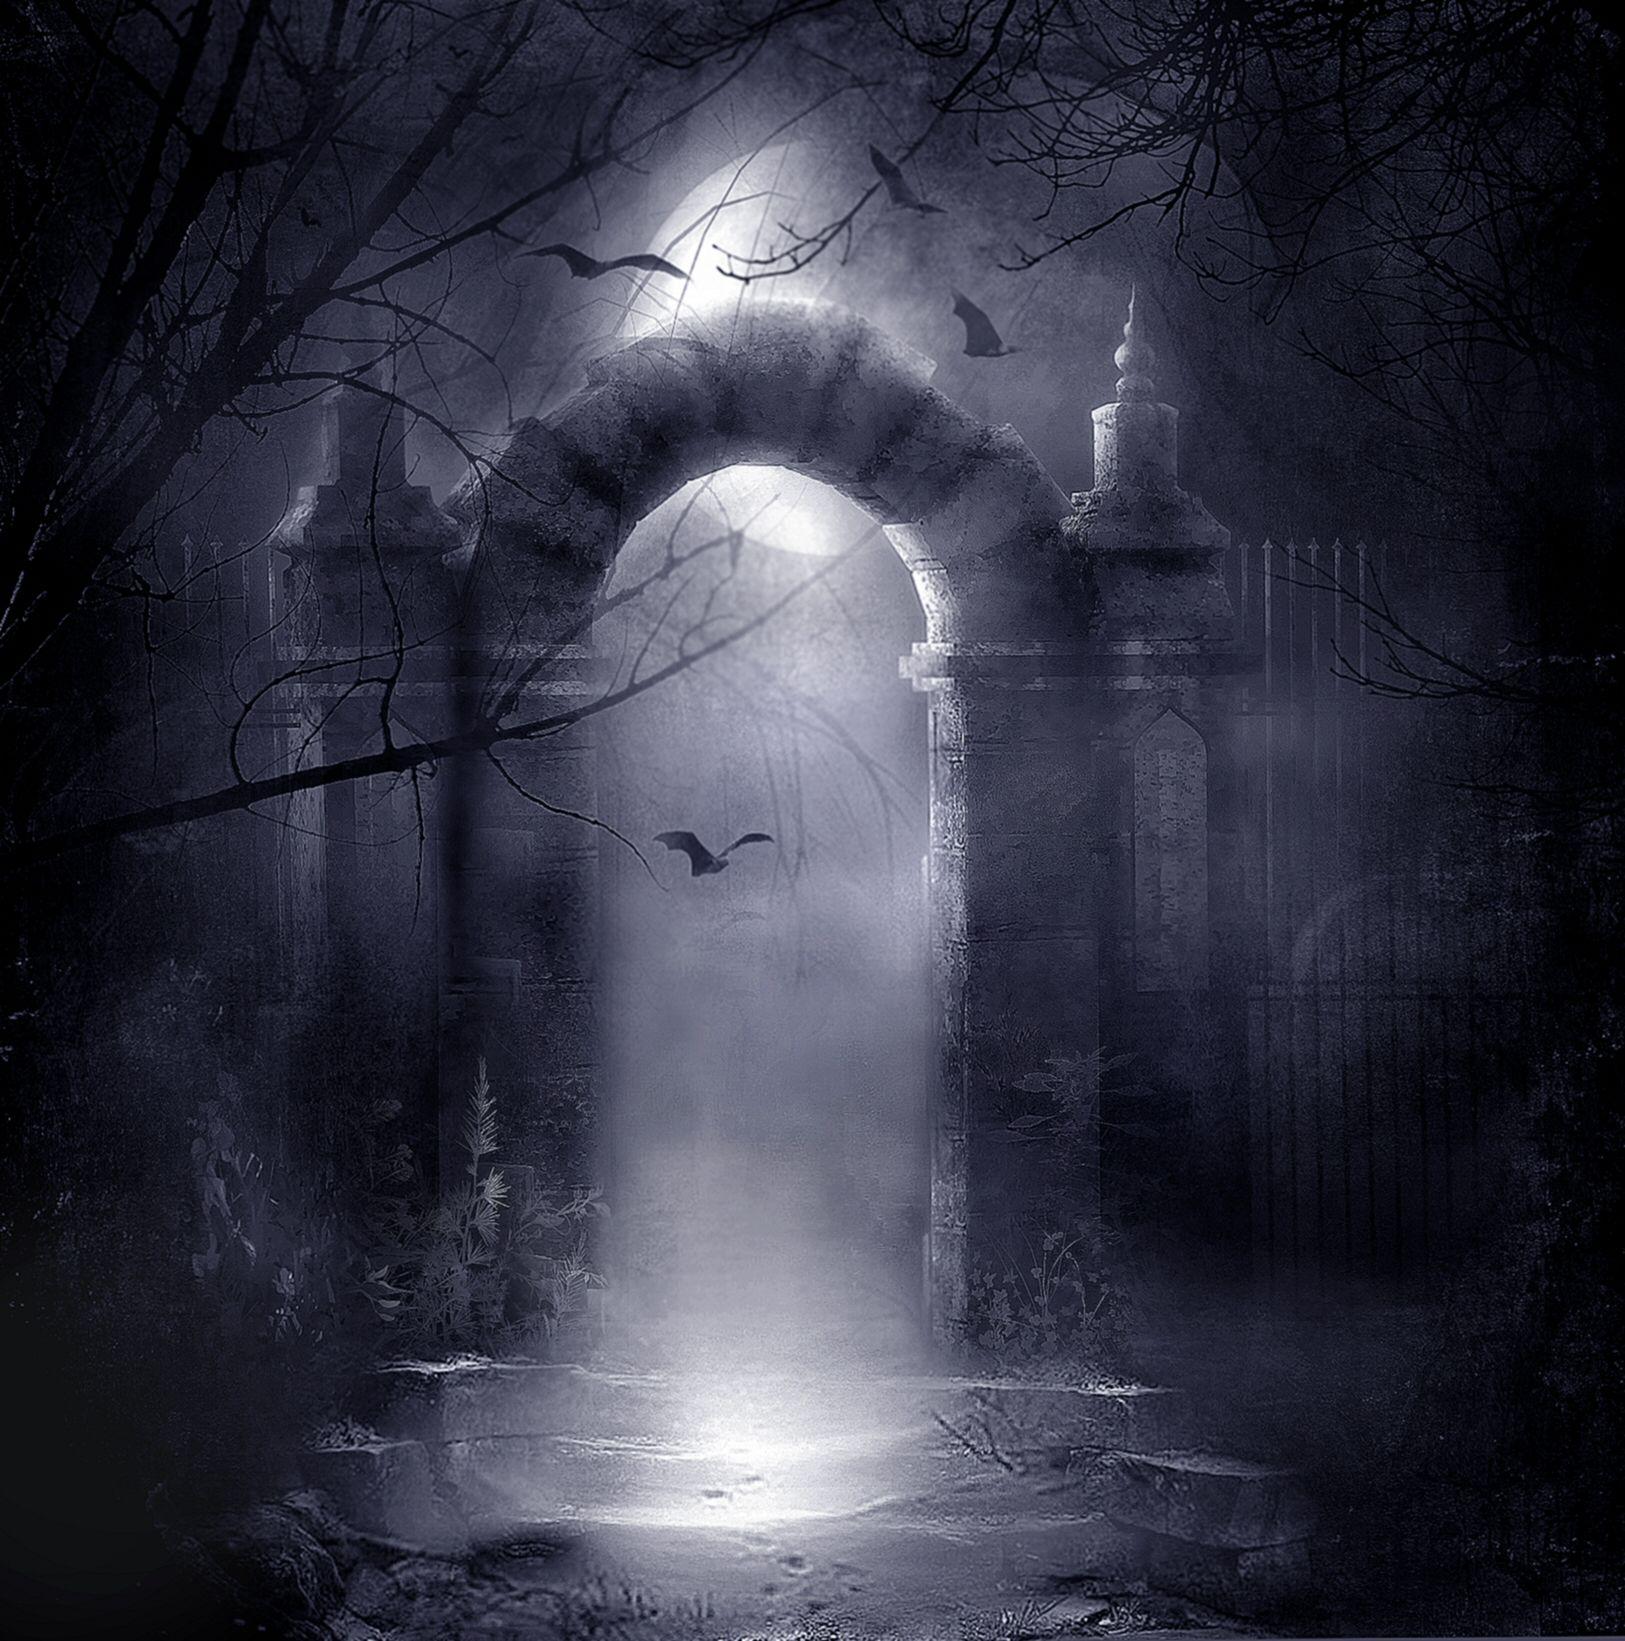 Dark Gothic Pictures